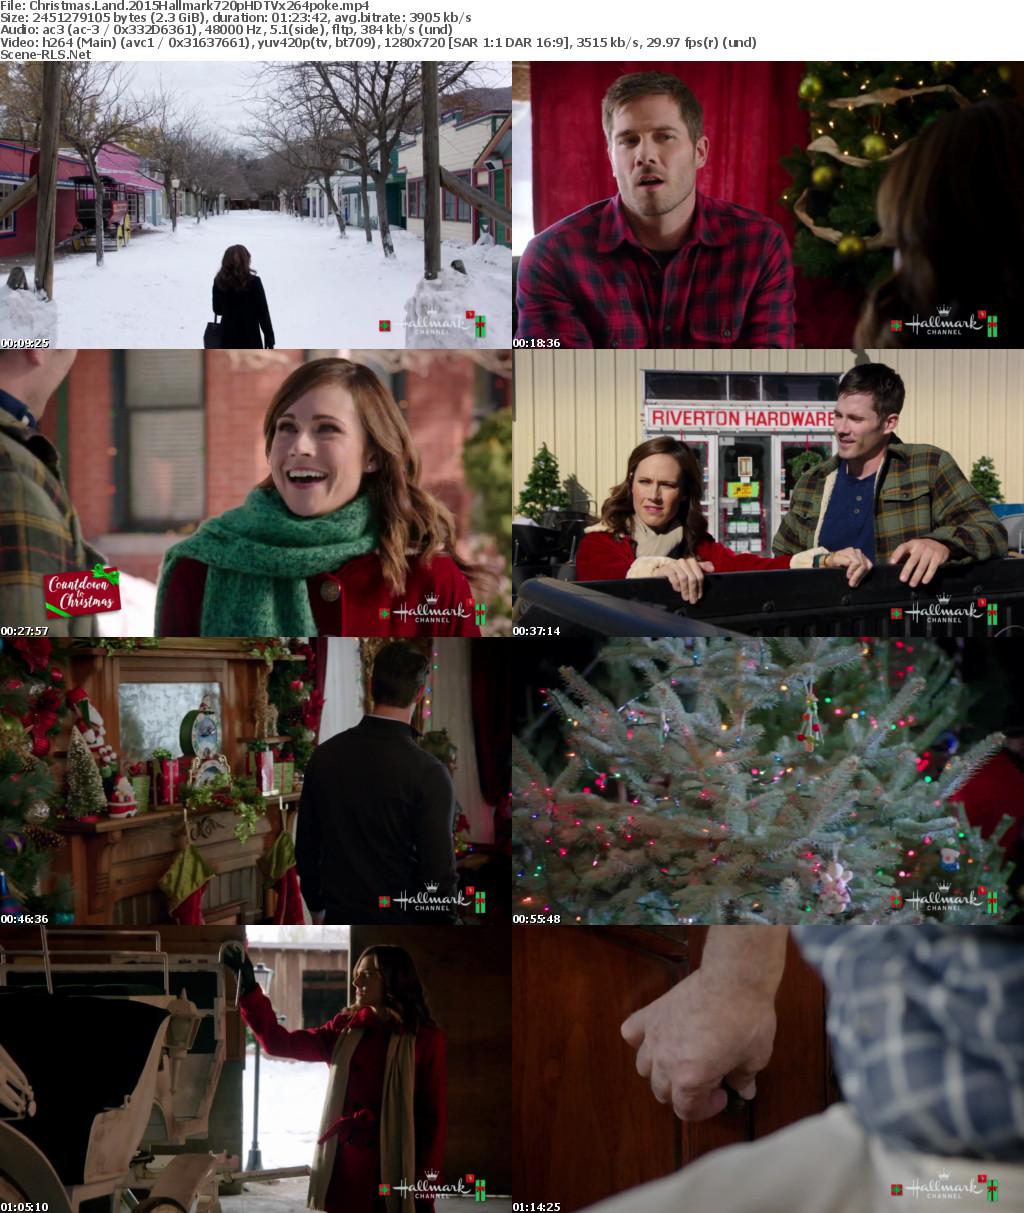 links screenshot imdb subtitle christmas land 2015 hallmark